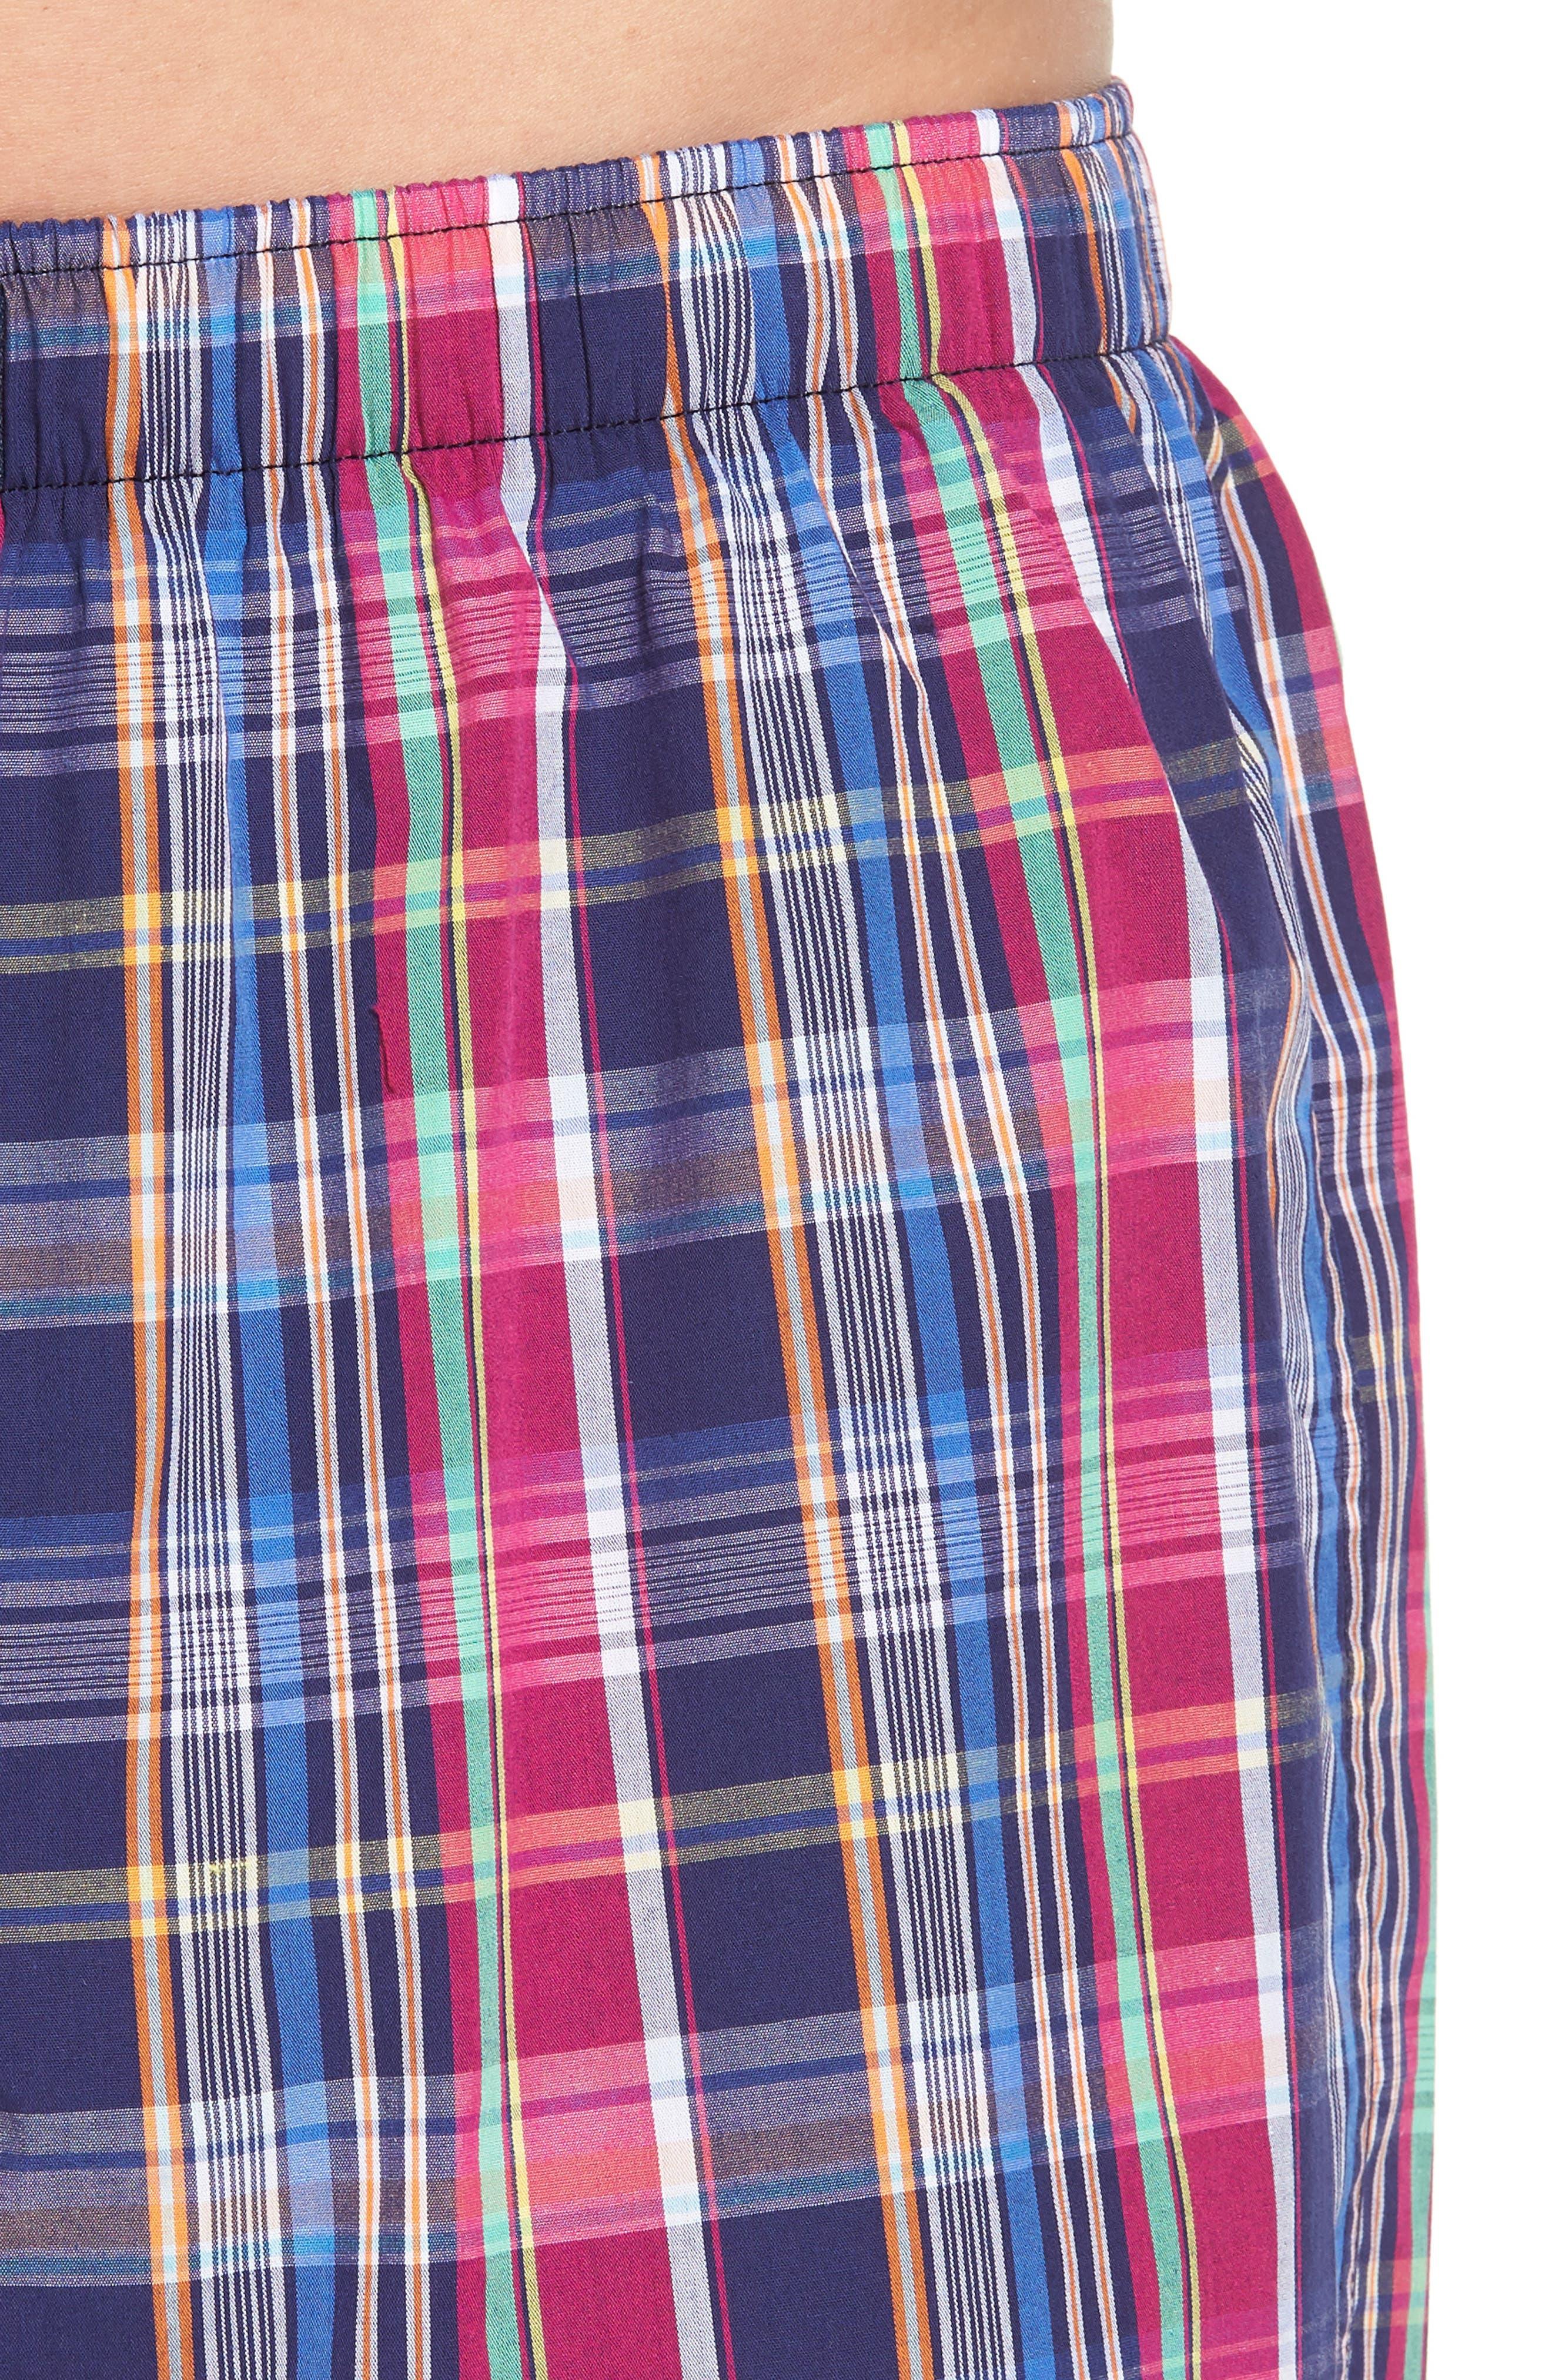 Woven Cotton Boxers,                             Alternate thumbnail 4, color,                             Collin Plaid/ Bright Pink